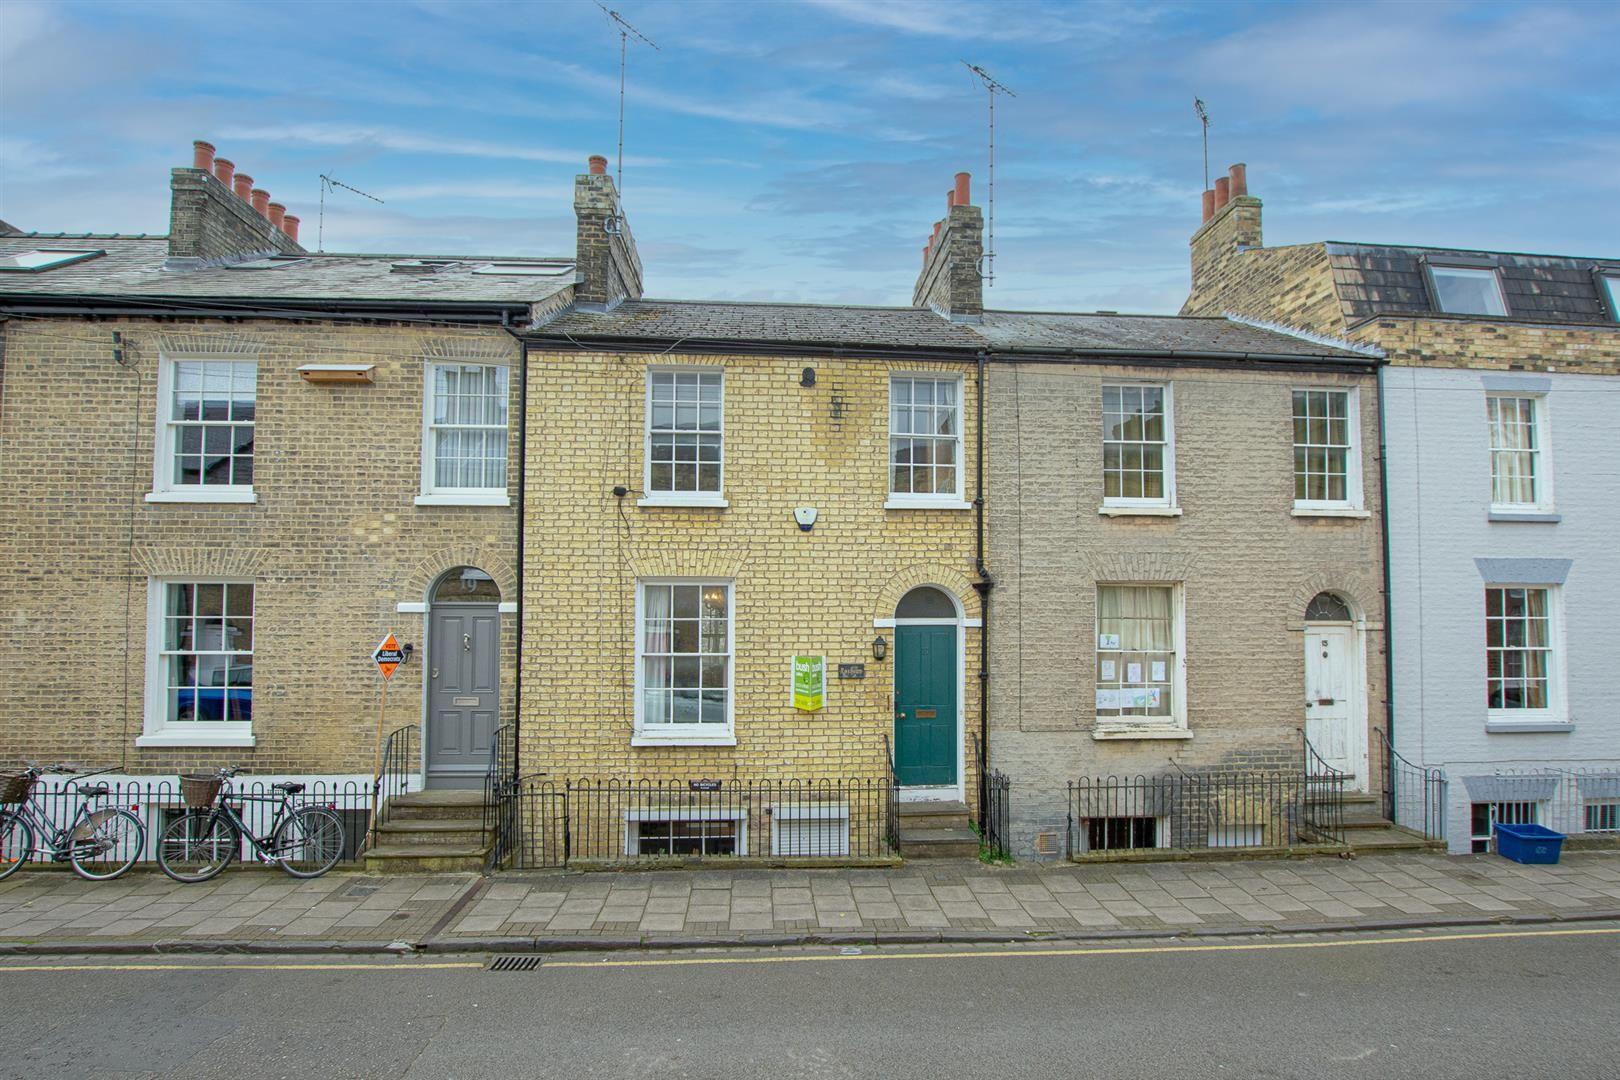 Property photo 1 of 18. Dsc_0054.Jpg